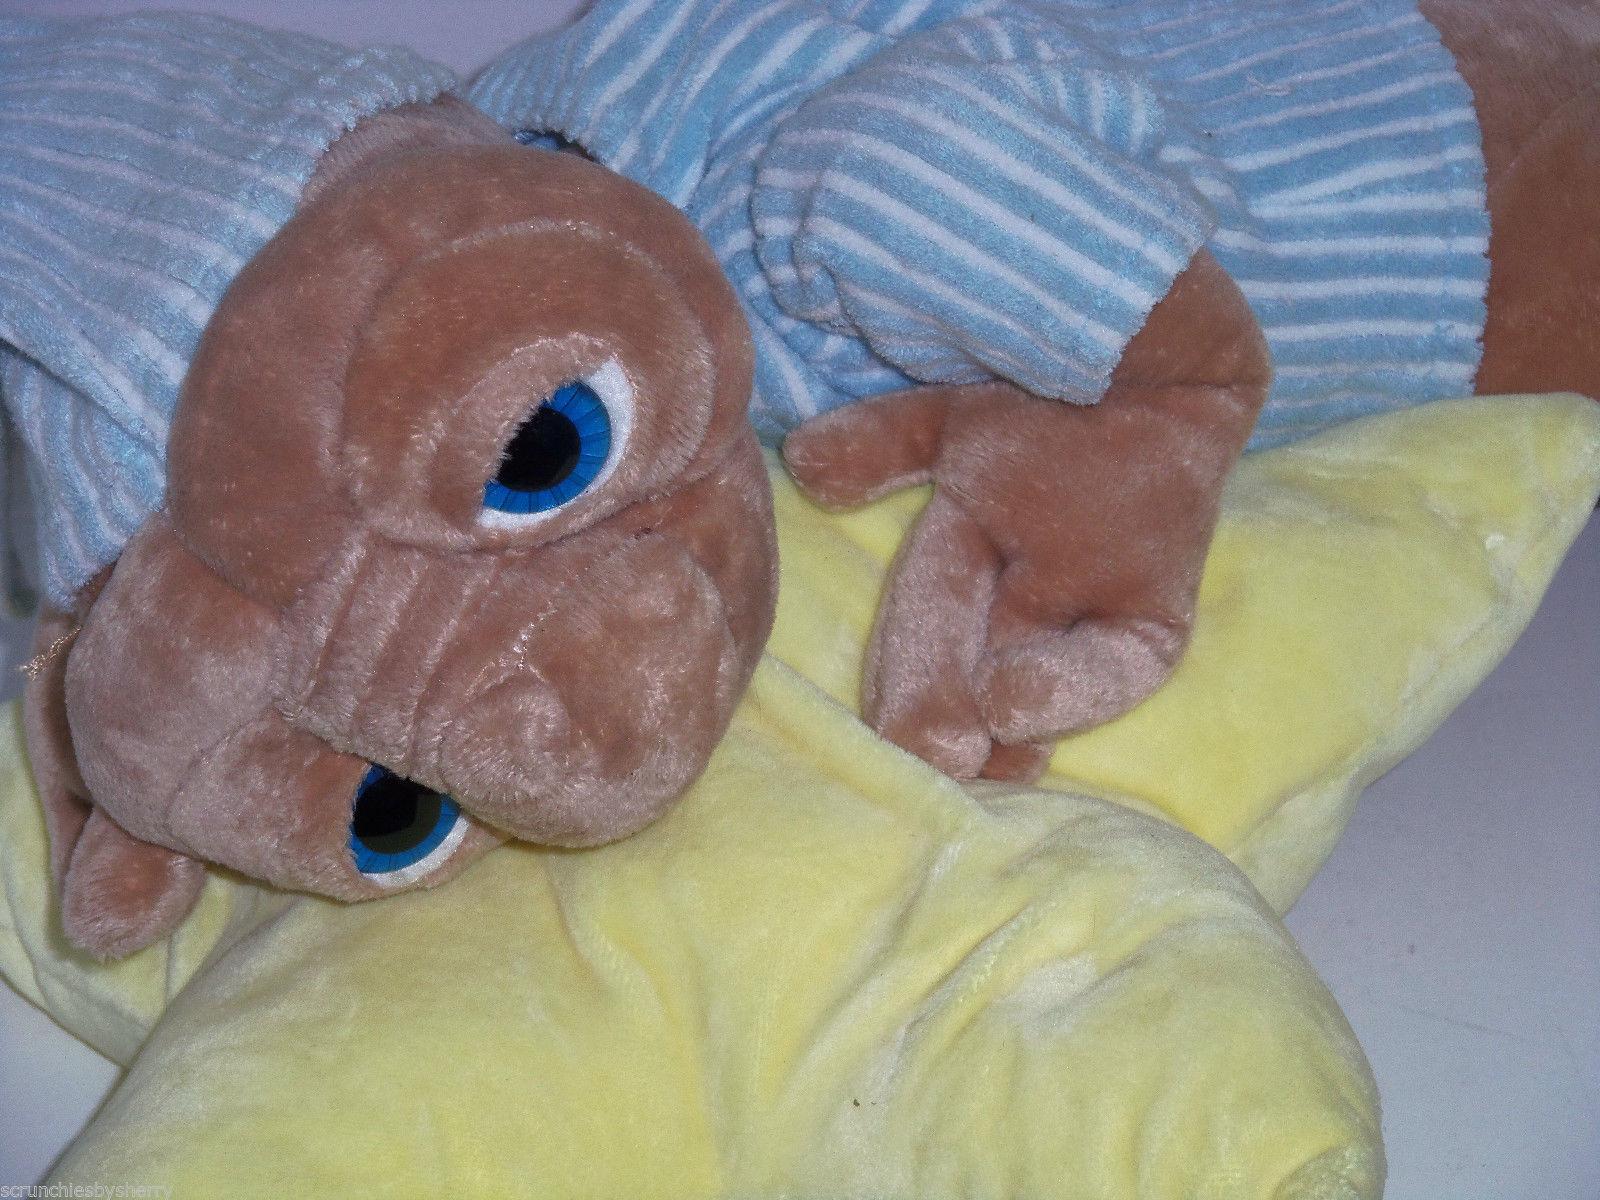 ET Plush Toy Universal Studios Yellow Star Pillow Extra Terrestrial - $49.95